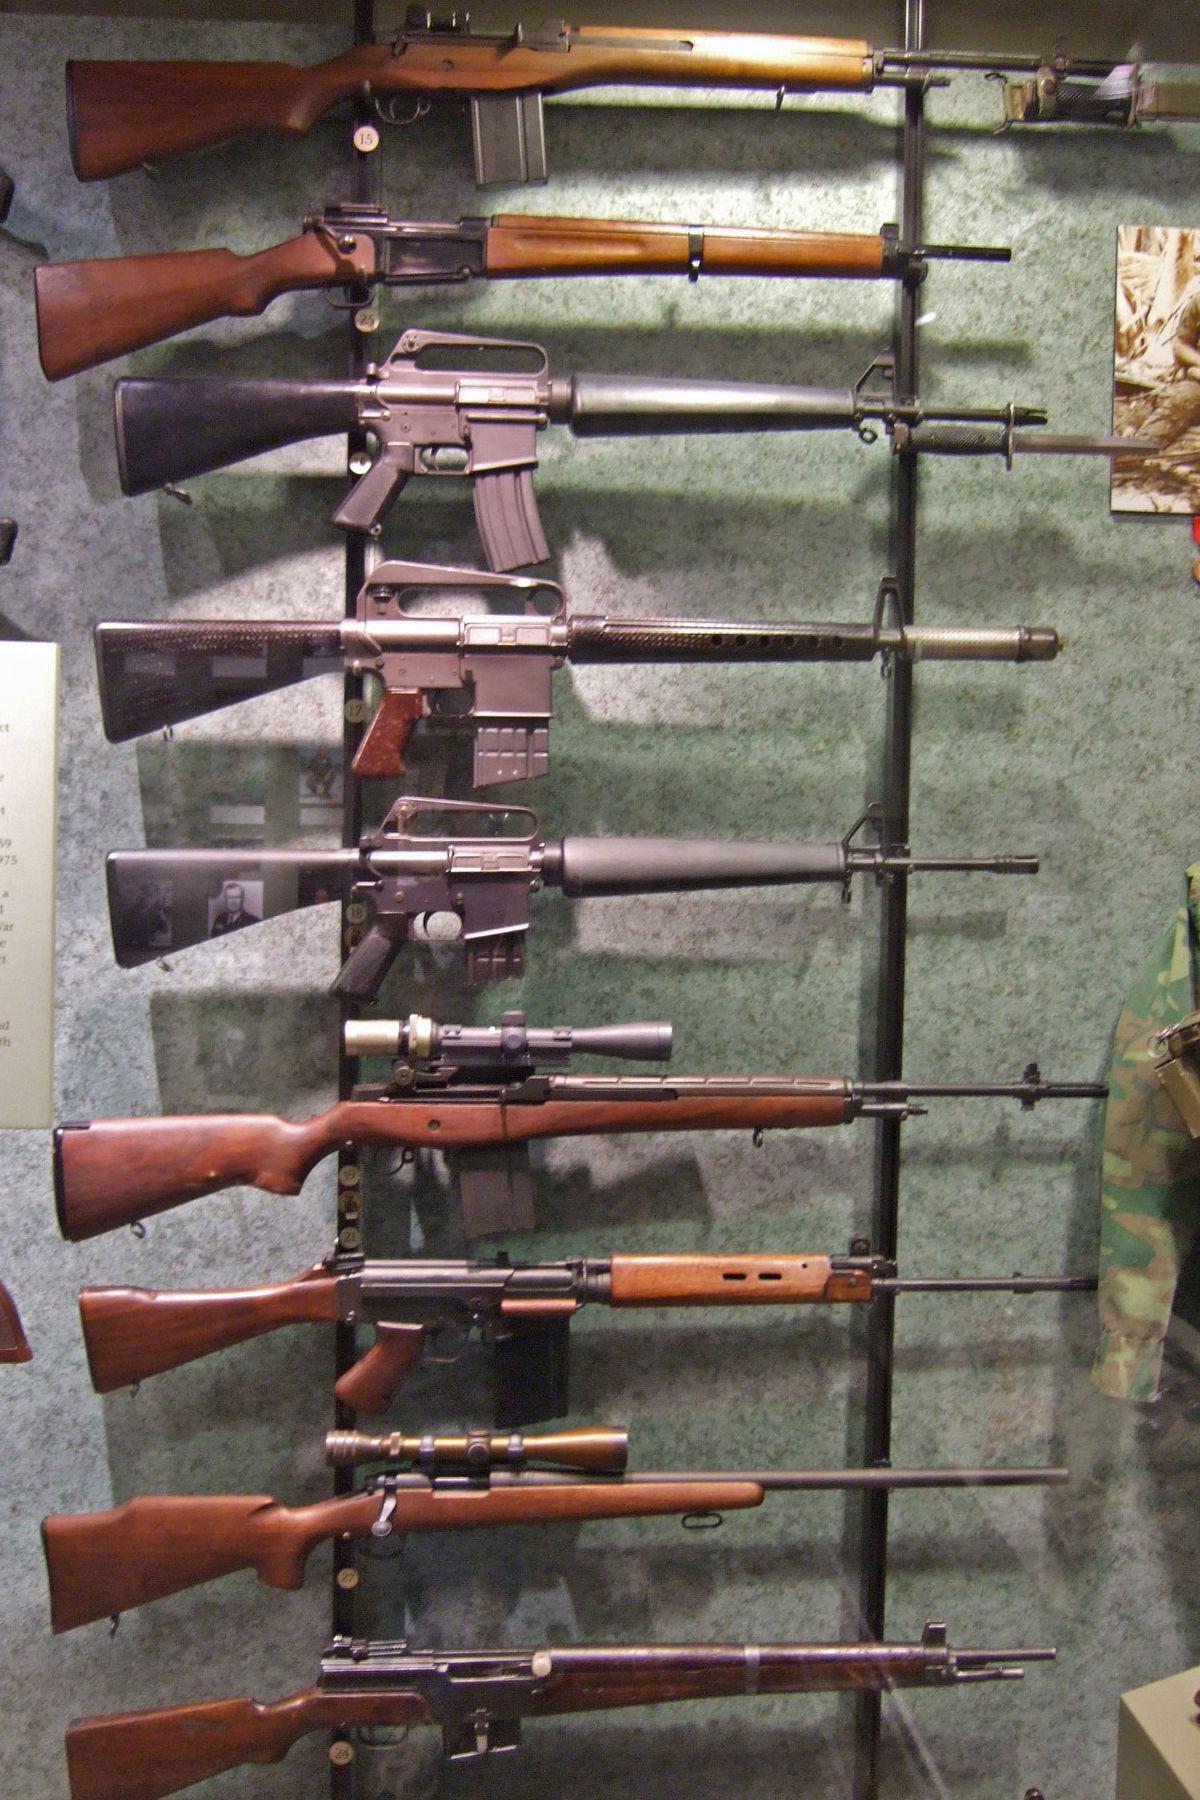 Weapons of the Vietnam War   ~*Photography Originally